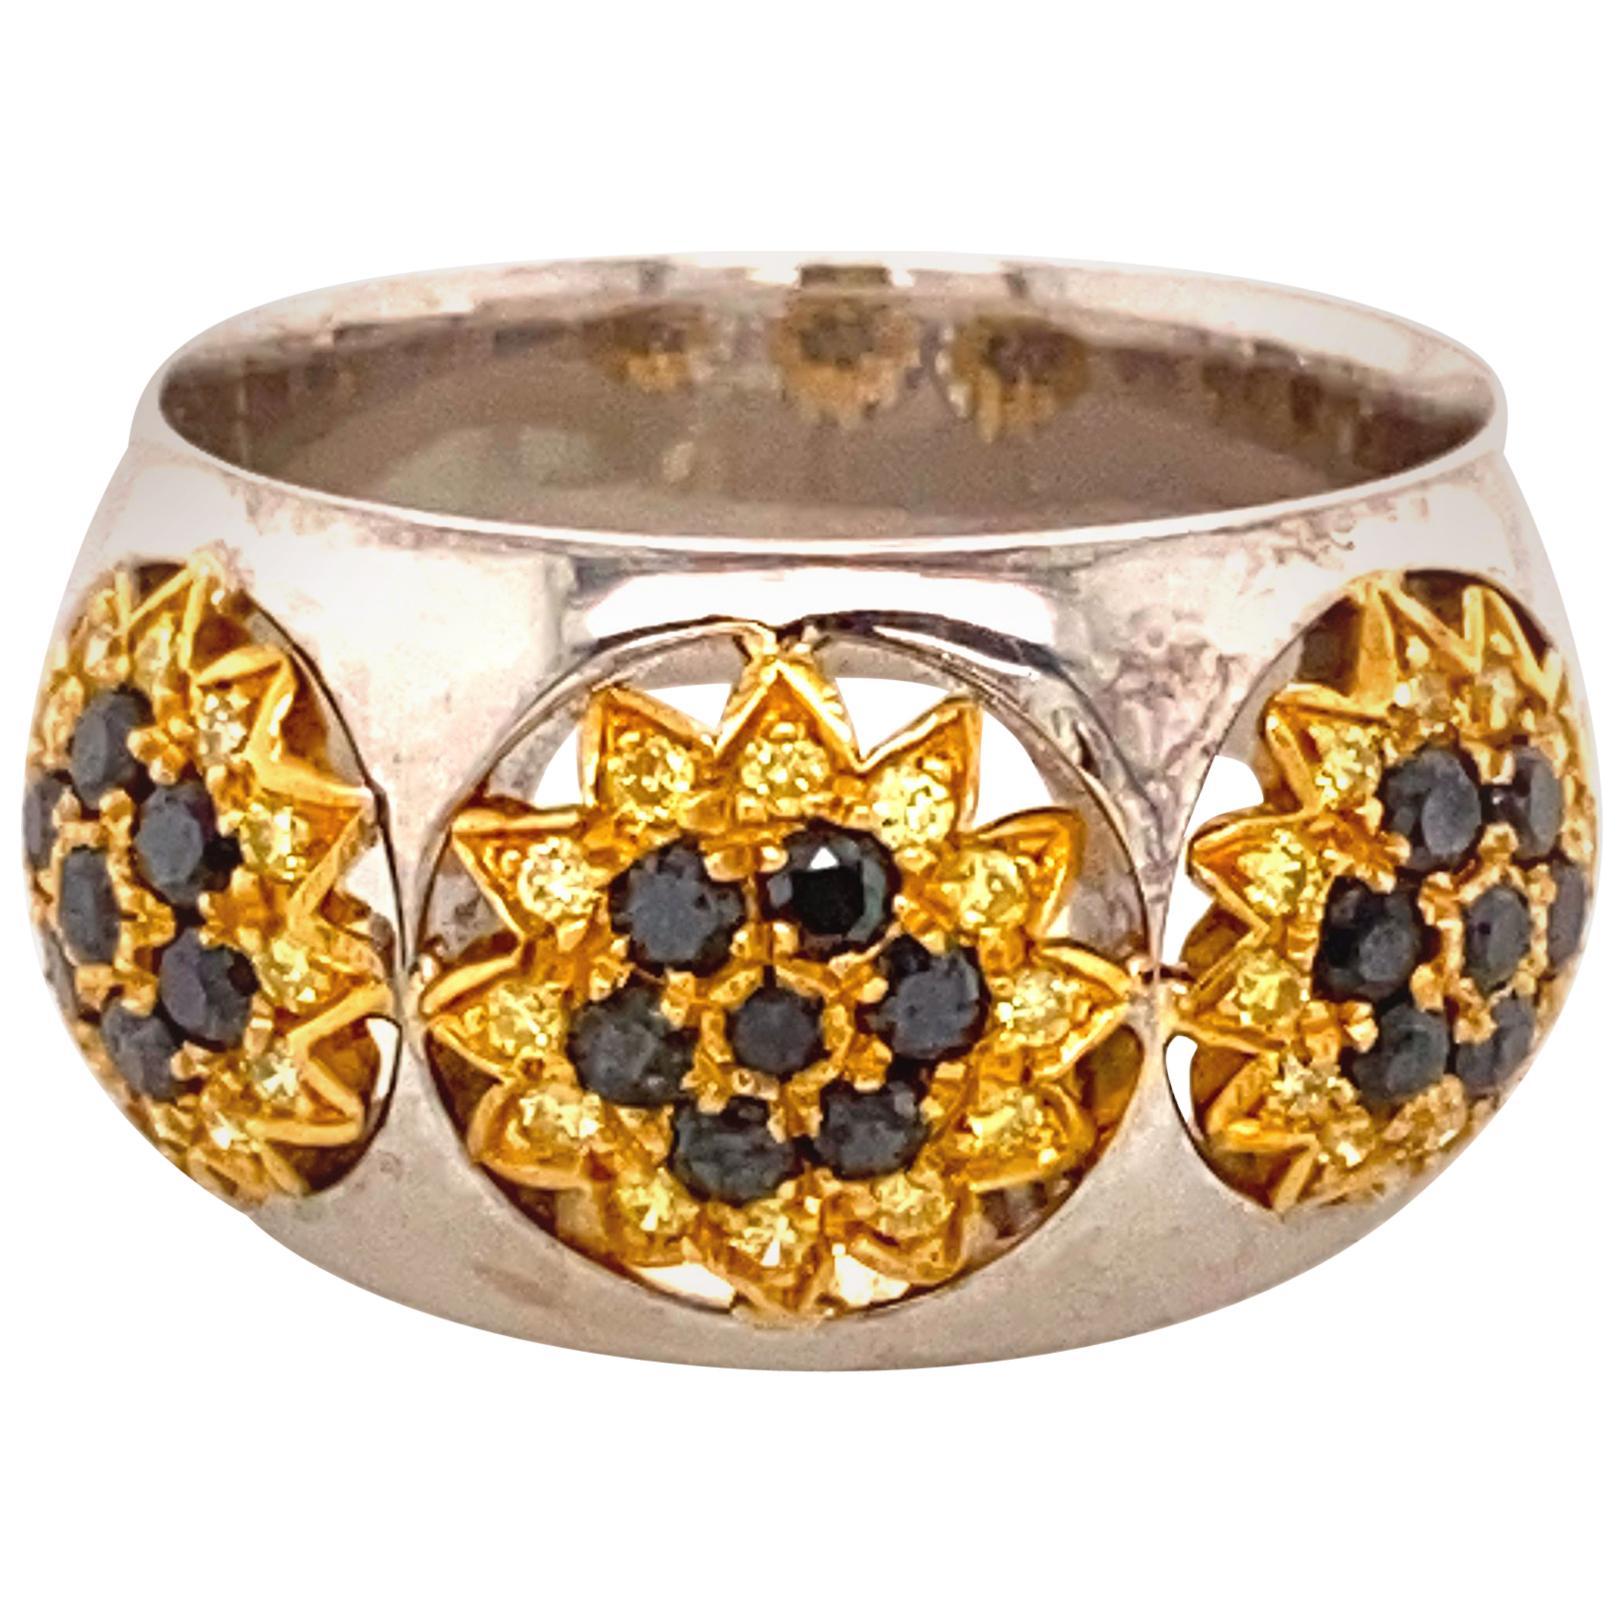 "Black Diamond and Yellow Diamond 18 Karat/24 Karat Gold ""Sunflower"" Ring"